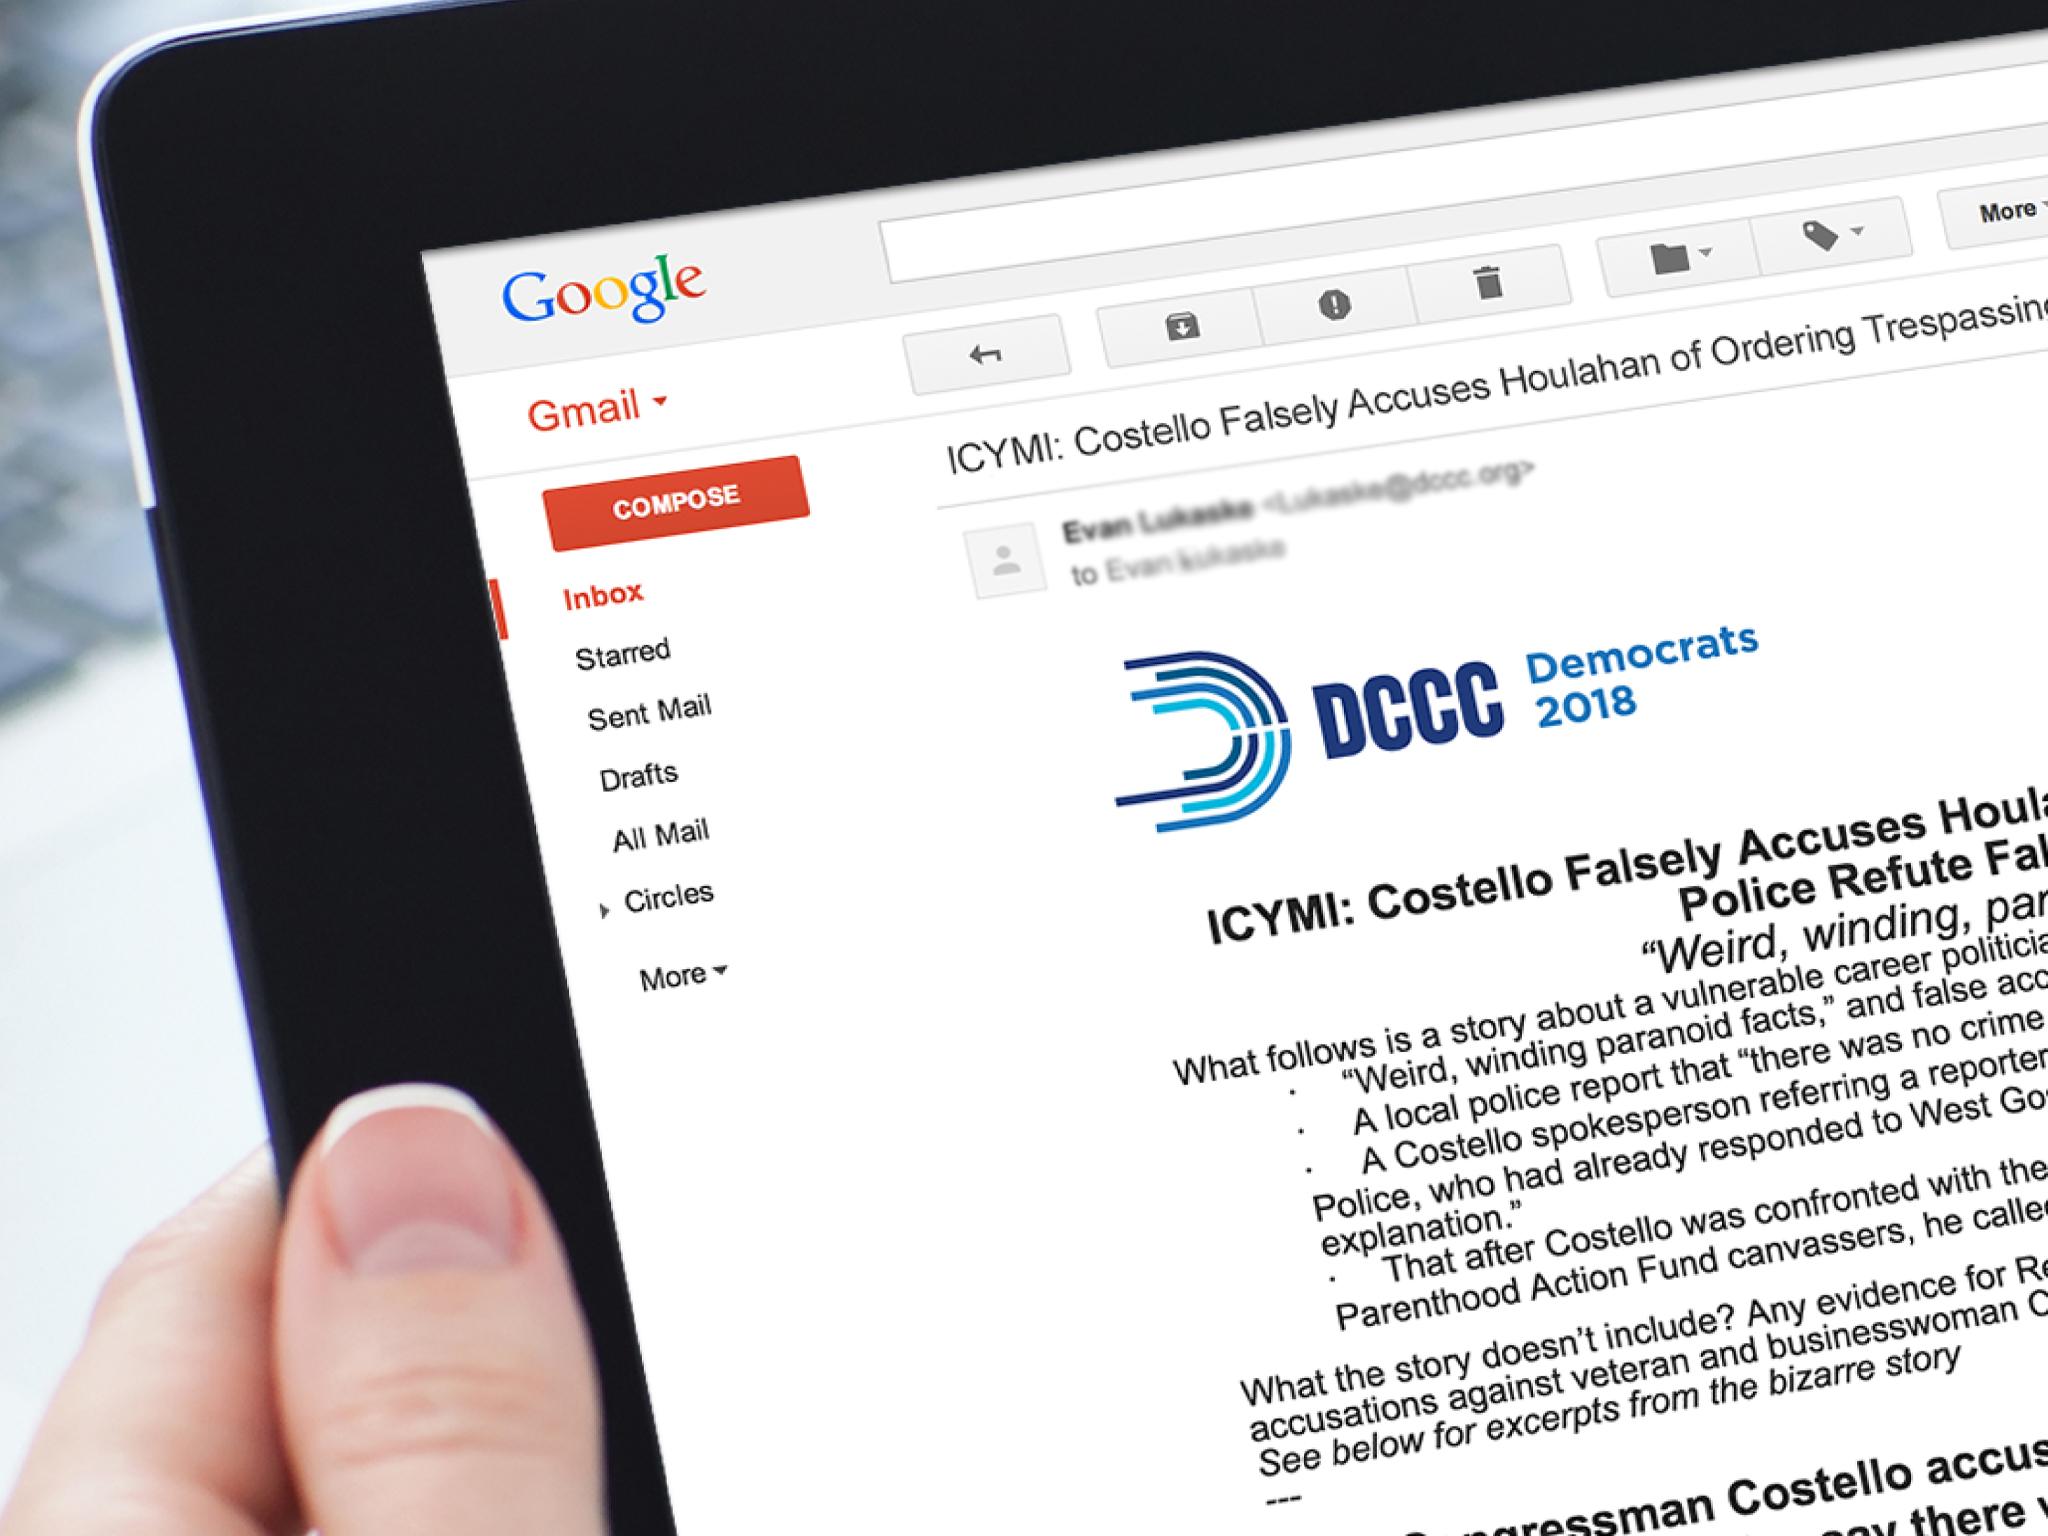 jkdc_dccc-presents-email.jpg